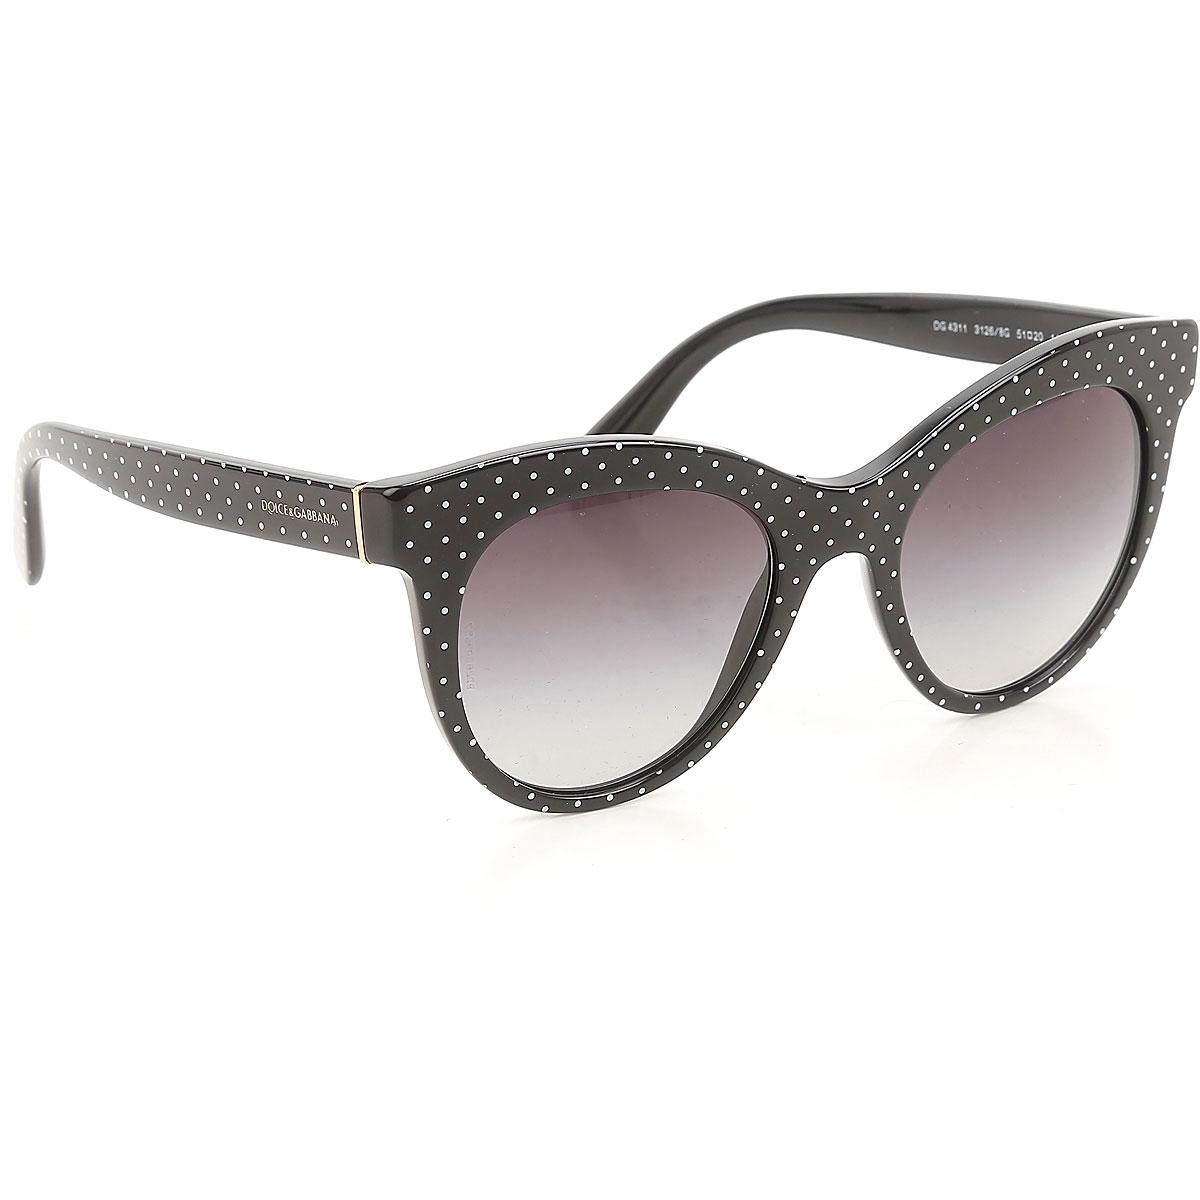 Dolce&Gabbana DG4311 3126/8G Sonnenbrille fKpyGAdLb